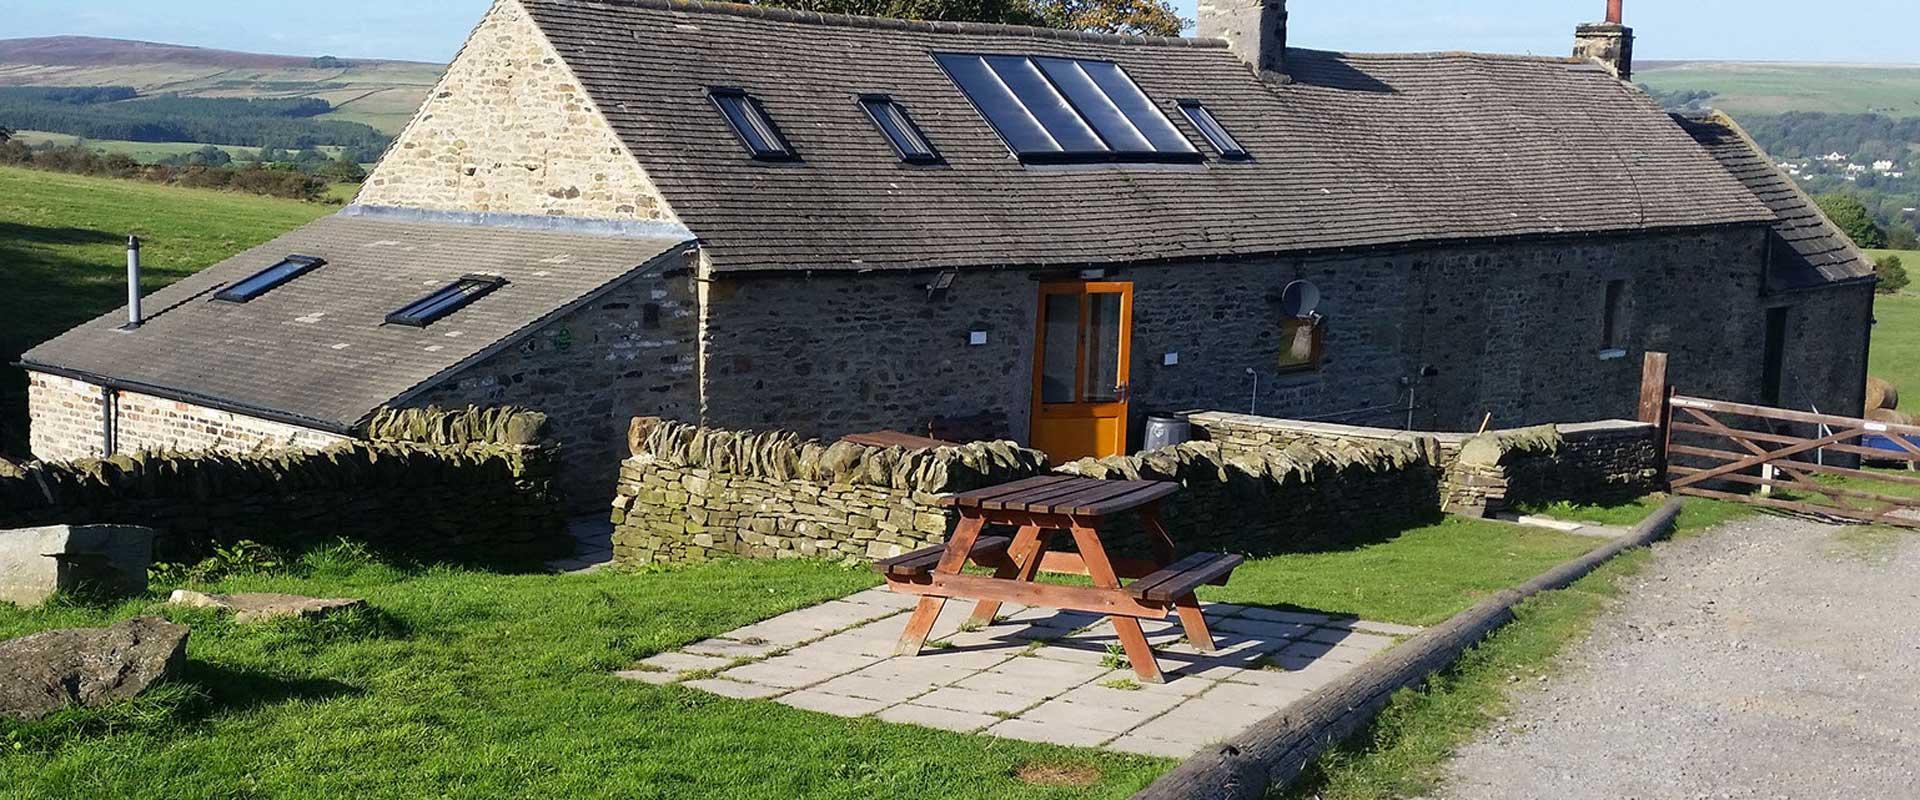 Carrs Farm Bunkhouse & Hostel